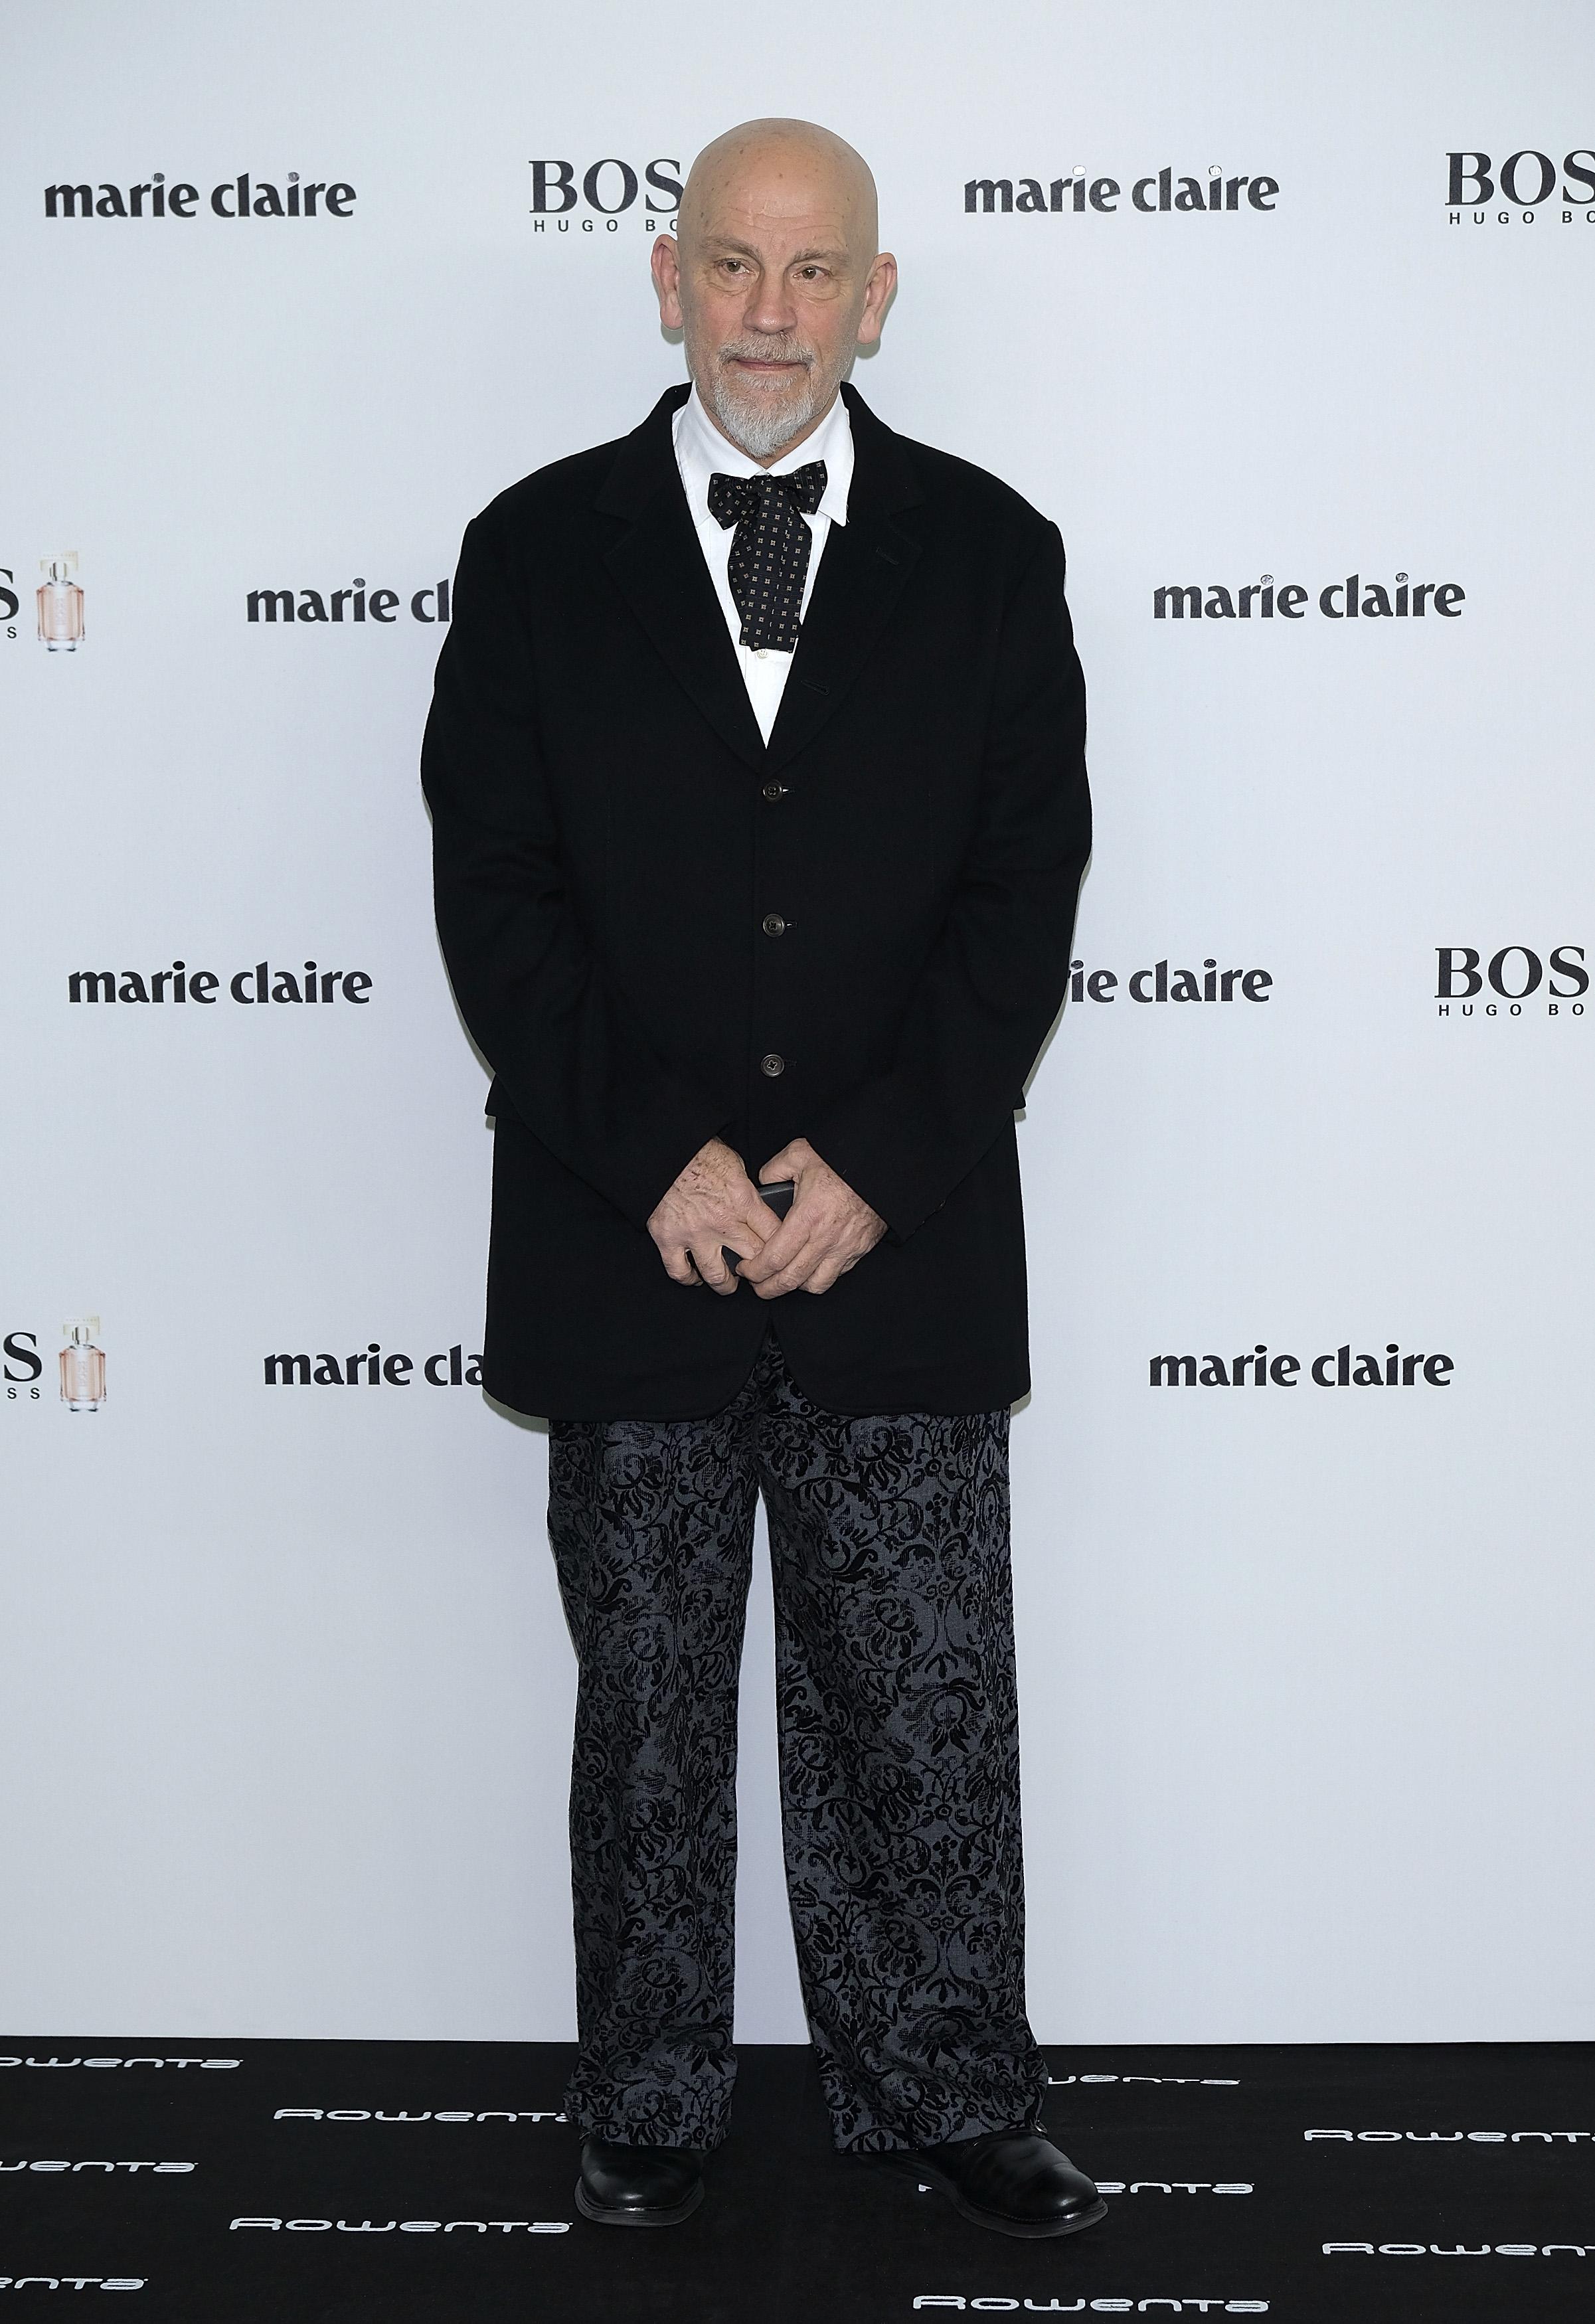 John Malkovich attends the 'Marie Claire Prix De La Moda' awards at Florida Retiro on November 16, 2016 in Madrid, Spain. (Photo by